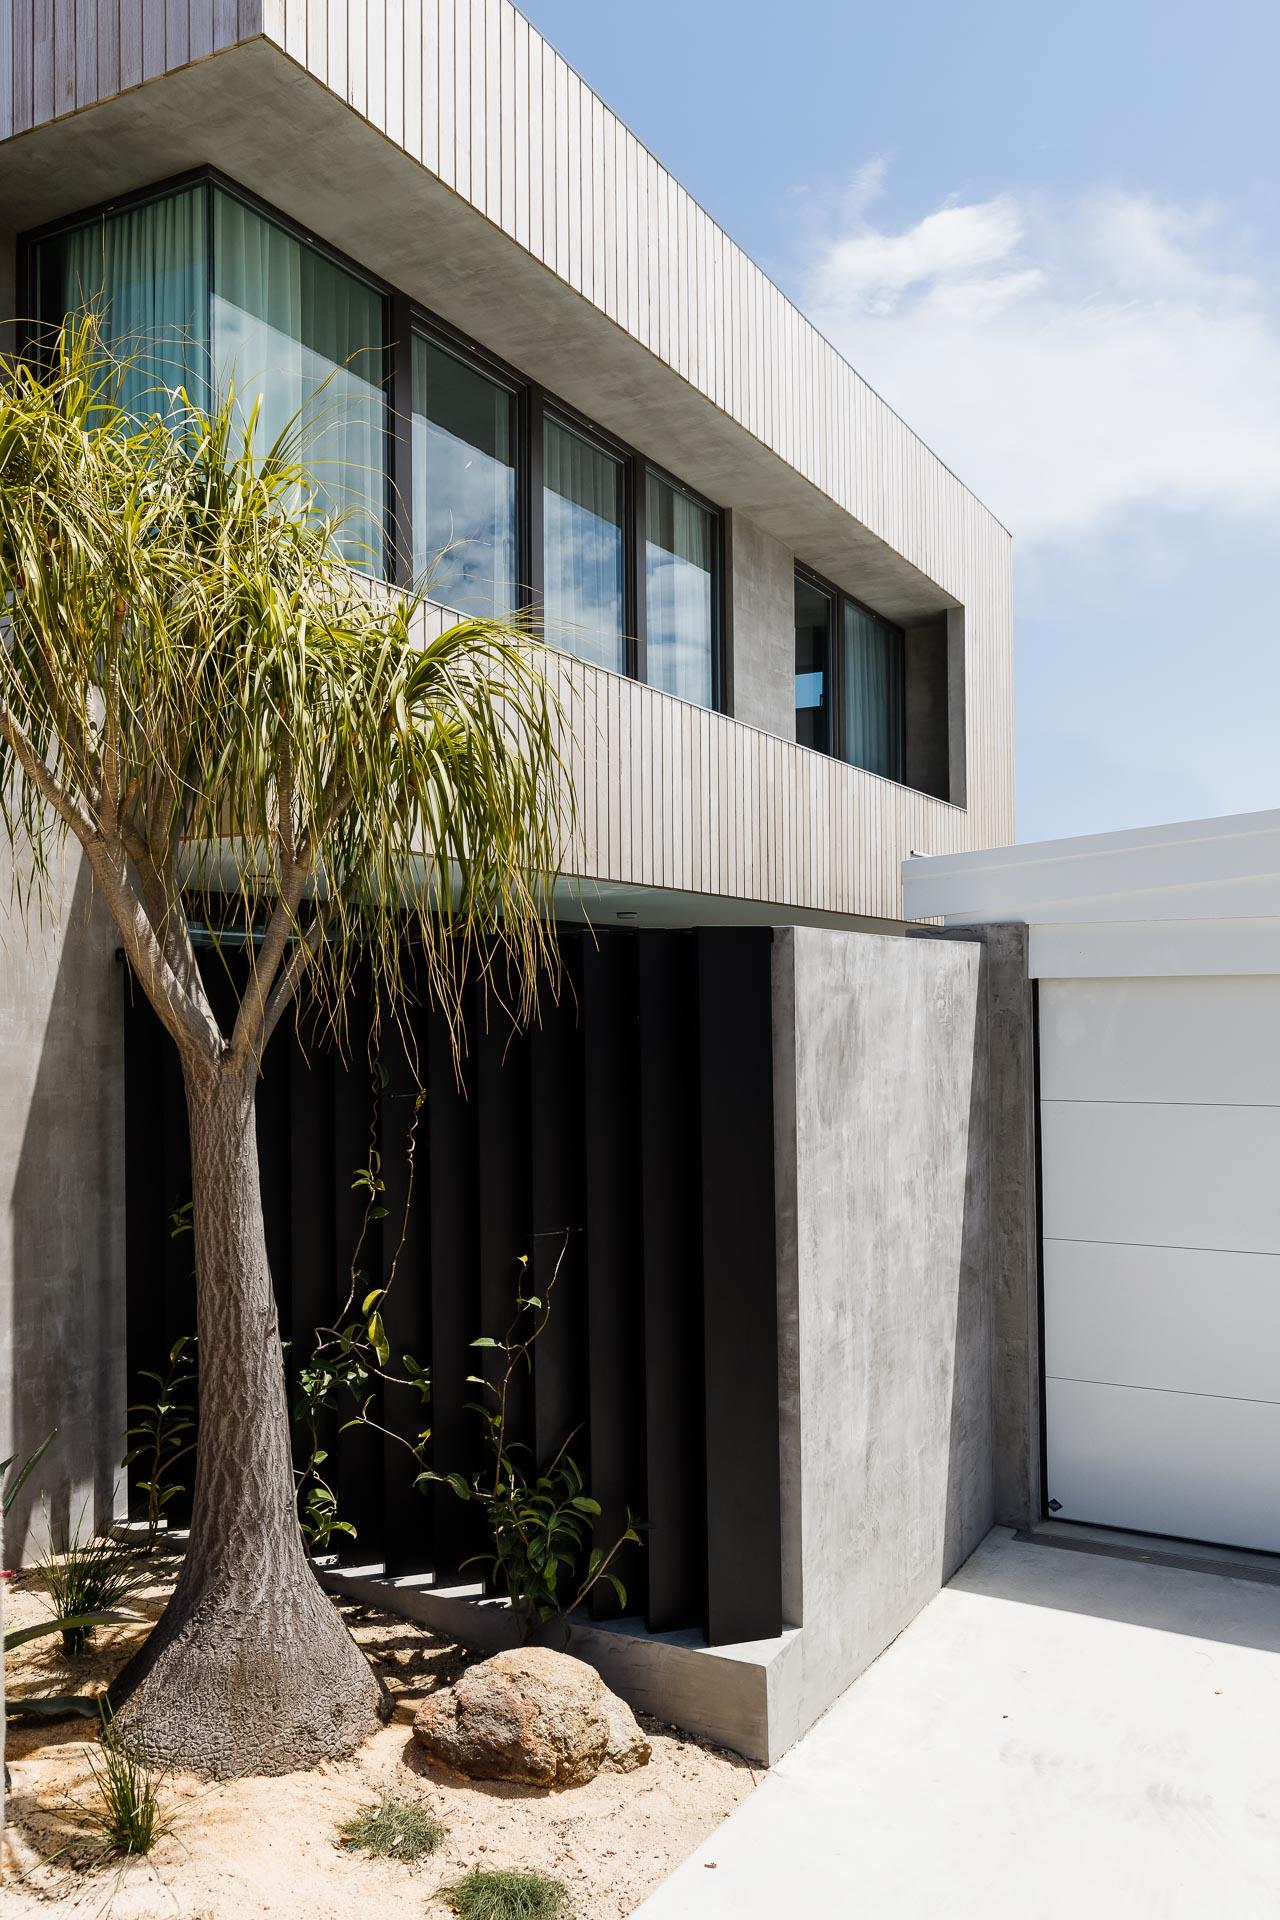 WEB - Architectural Photography Sydney - Open House Perth 2018  - Sebastian Photography 23.jpg